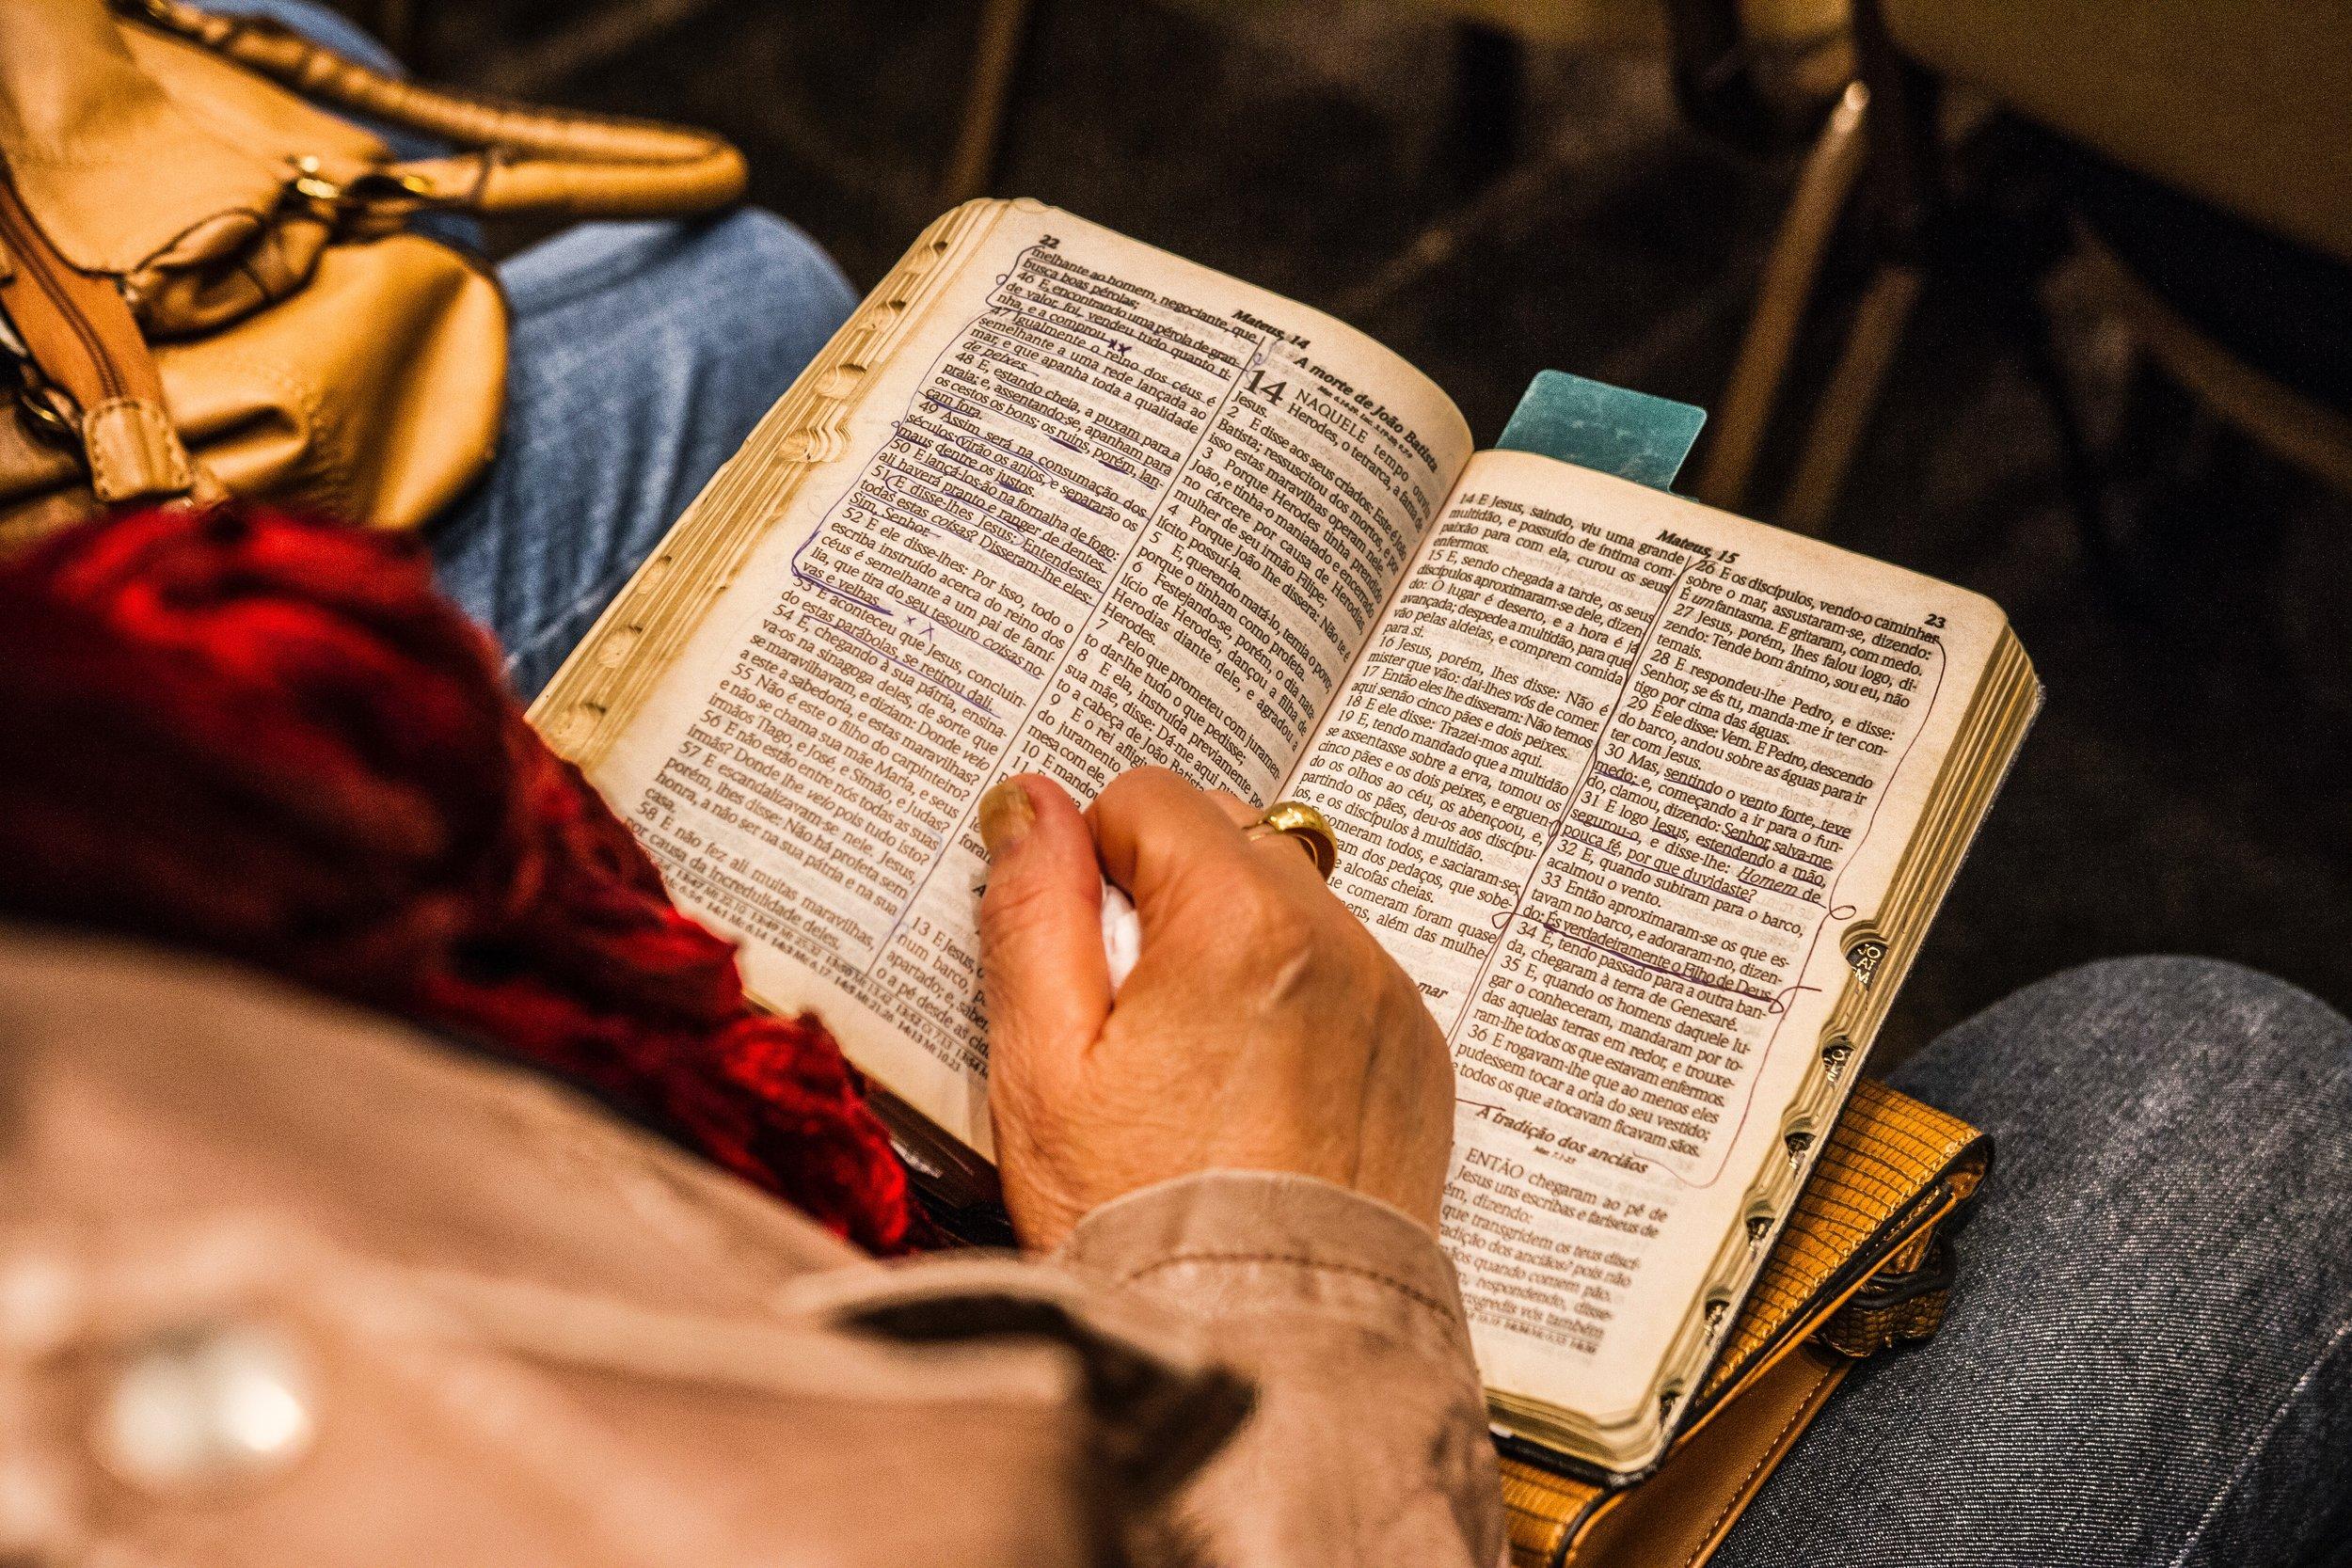 adult-bible-book-1296720.jpg